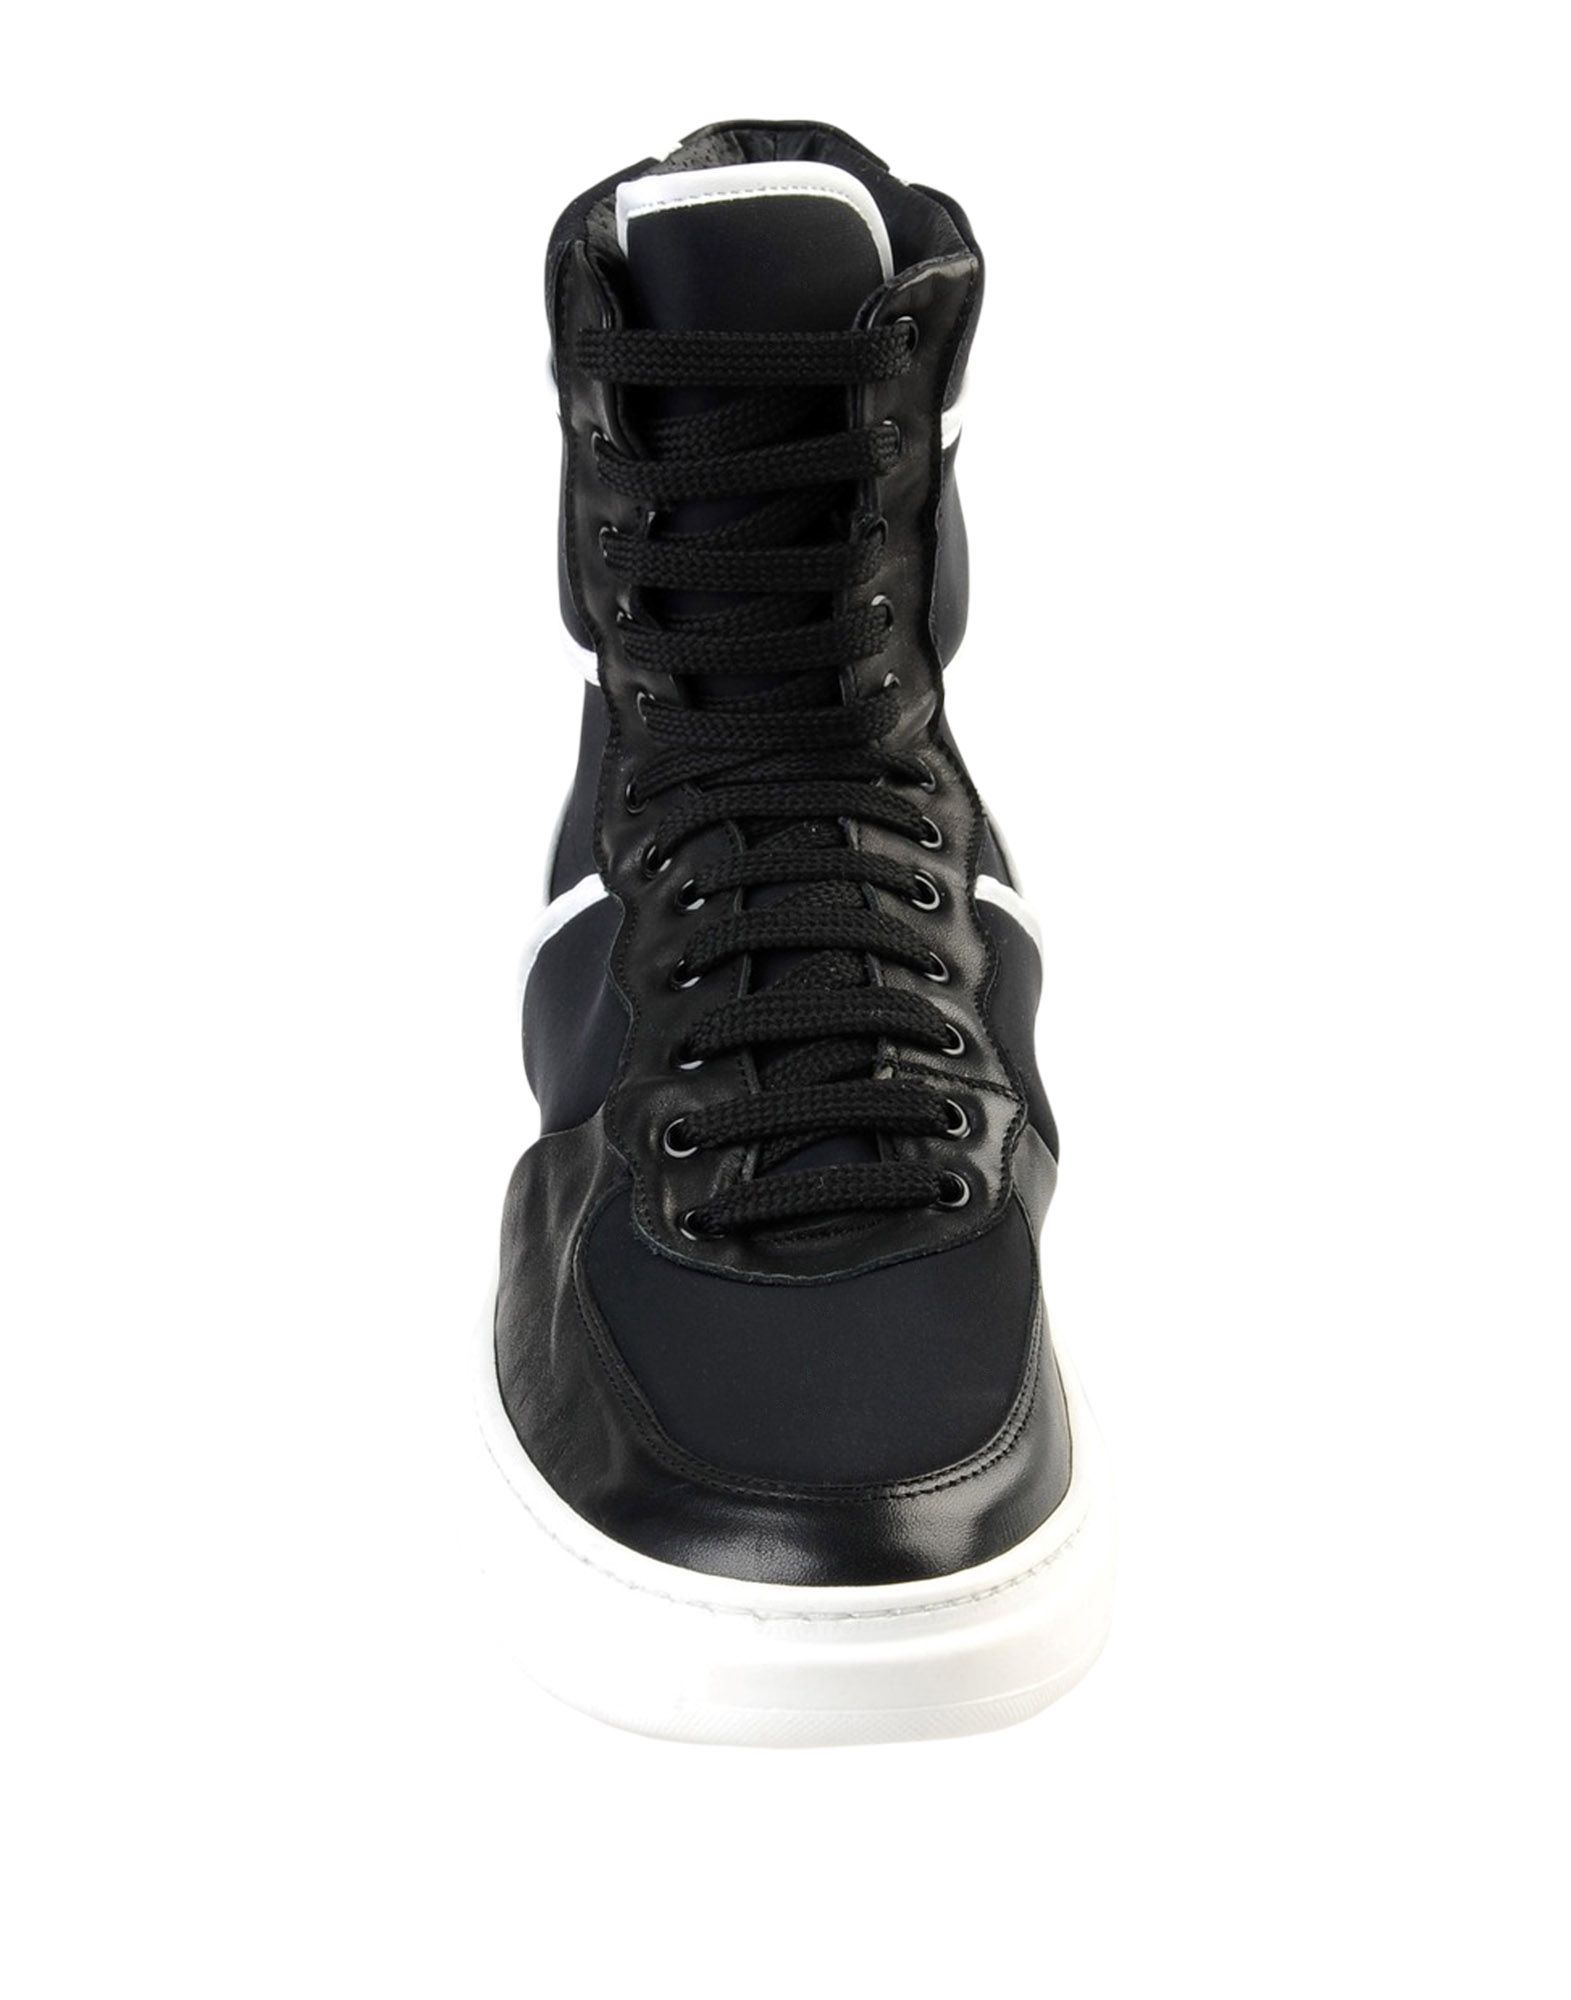 Rabatt 11536382JC echte Schuhe Pierre Darré Turnschuhes Herren 11536382JC Rabatt 070b24